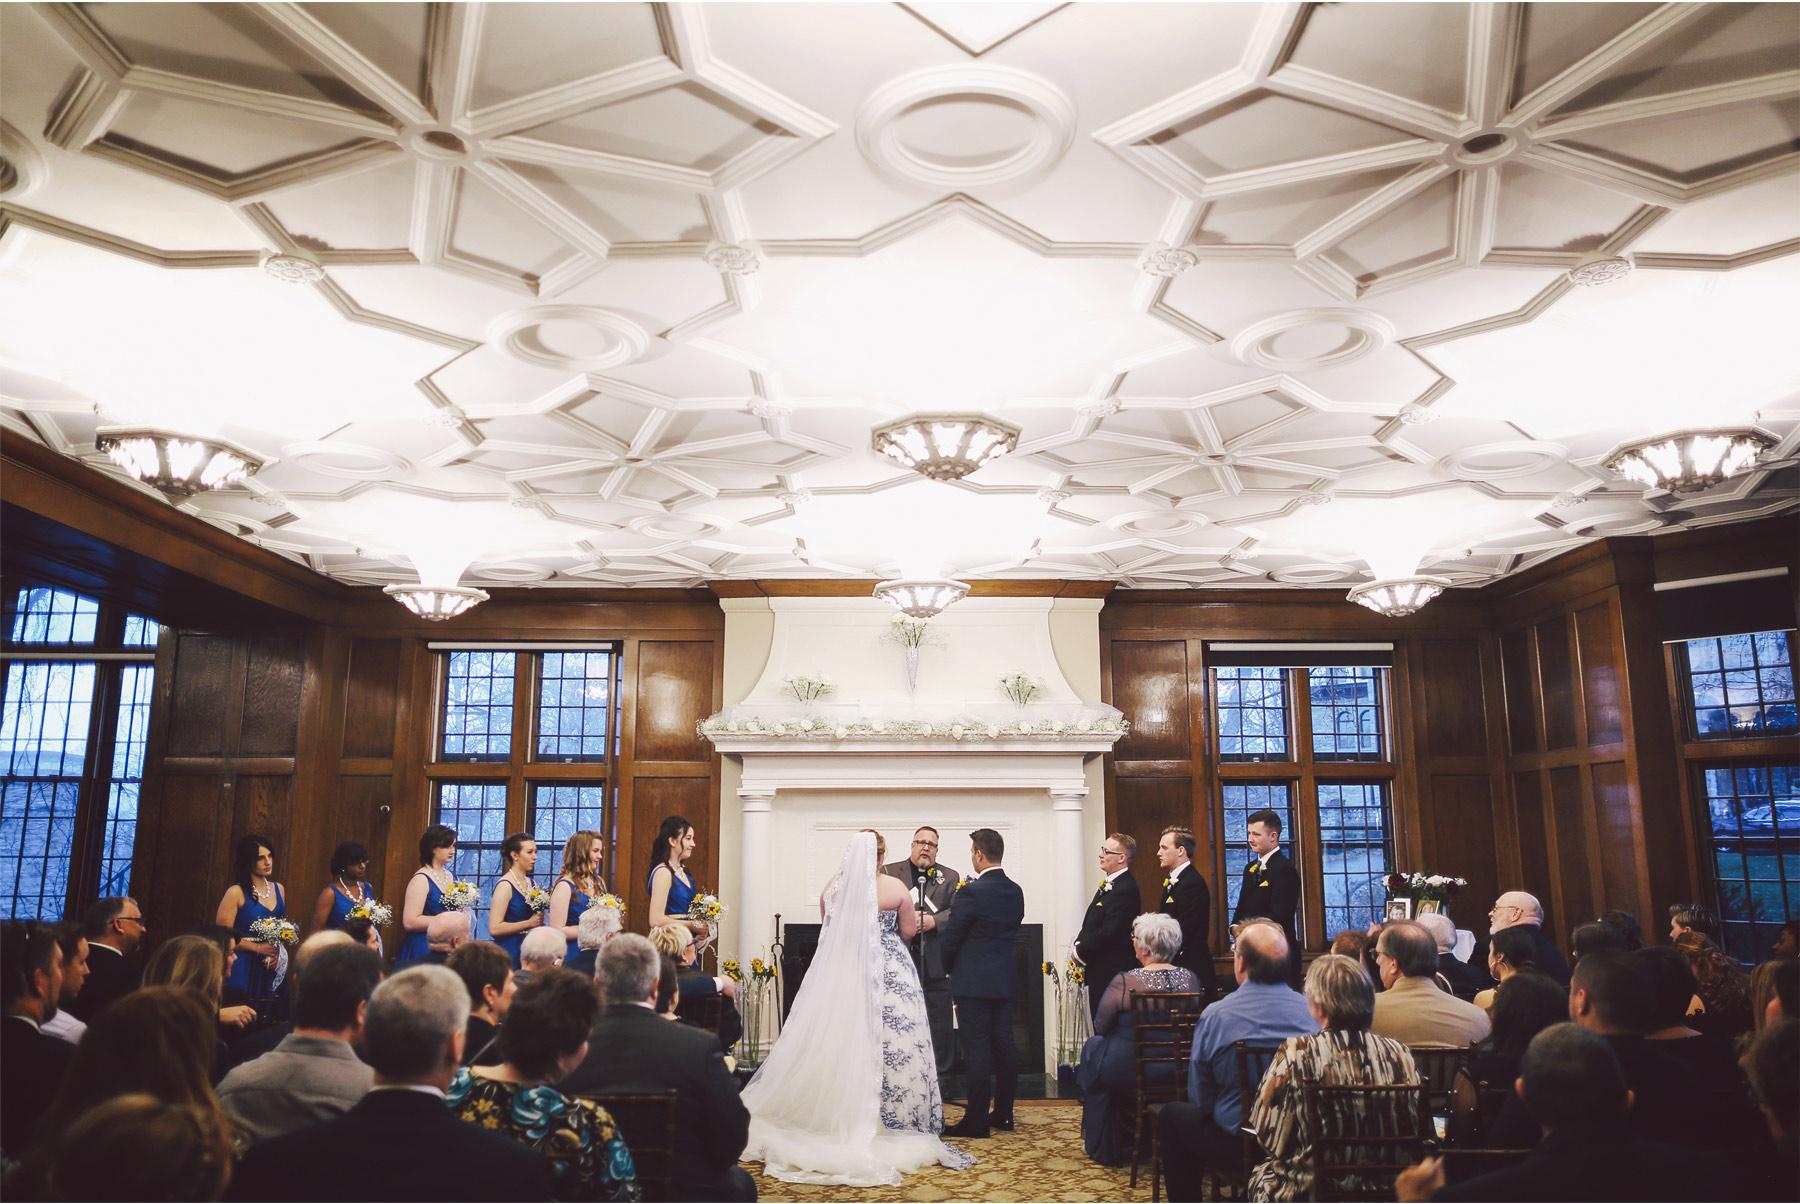 07-Saint-Paul-Minnesota-Wedding-Photography-by-Vick-Photography-The-University-Club-Ceremony-Mari-and-Giuseppe.jpg